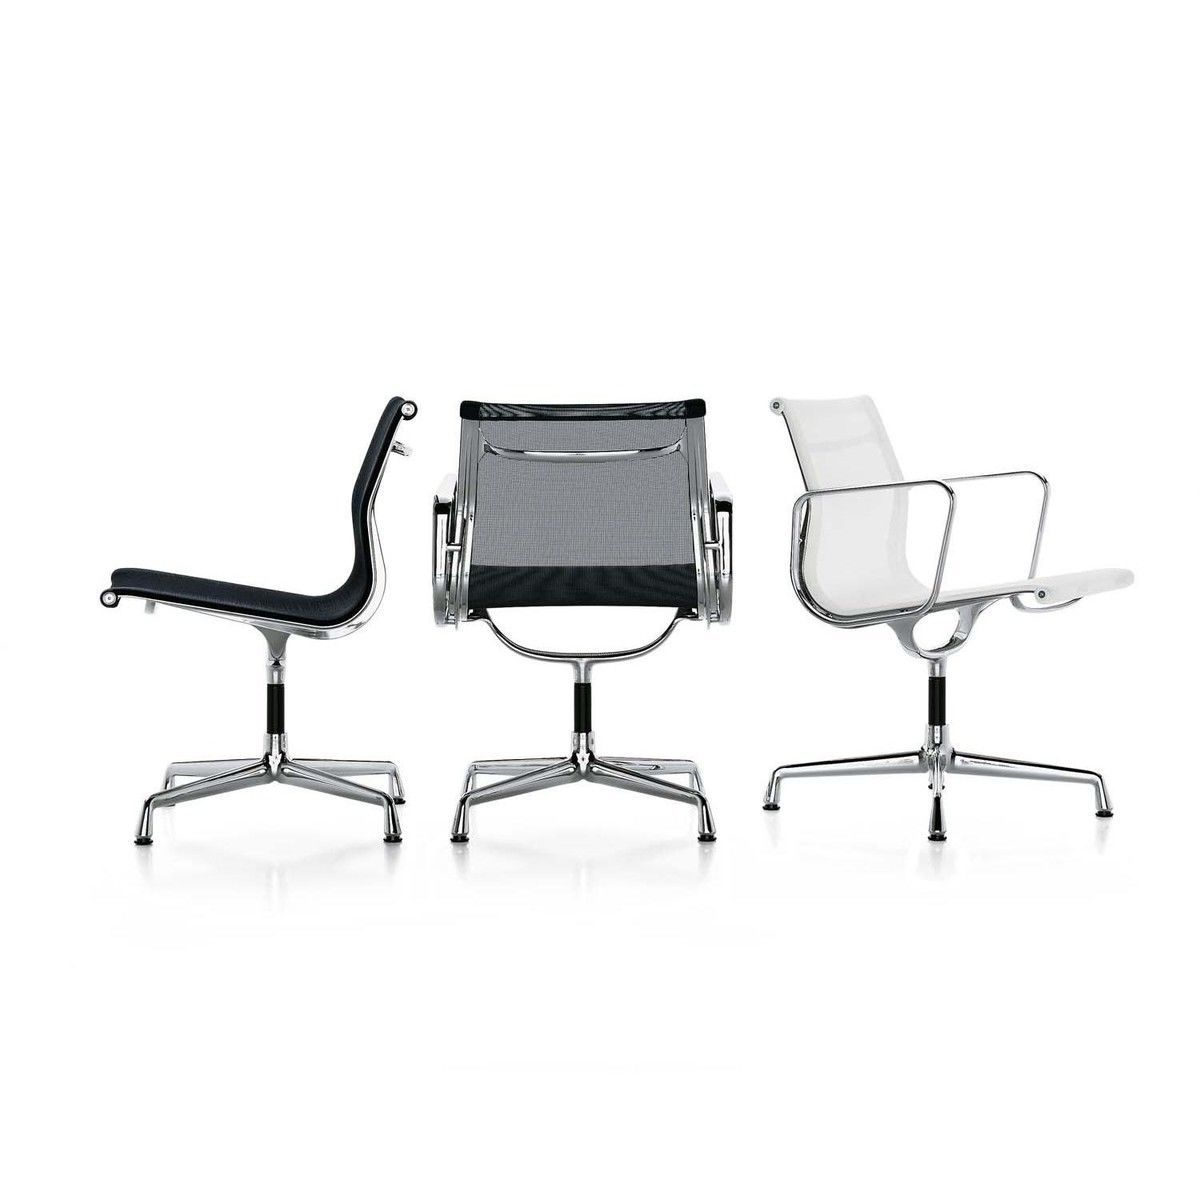 Bürostuhl Klassiker Vitra : vitra ea 108 aluminium chair b rostuhl vitra klassiker ~ Michelbontemps.com Haus und Dekorationen